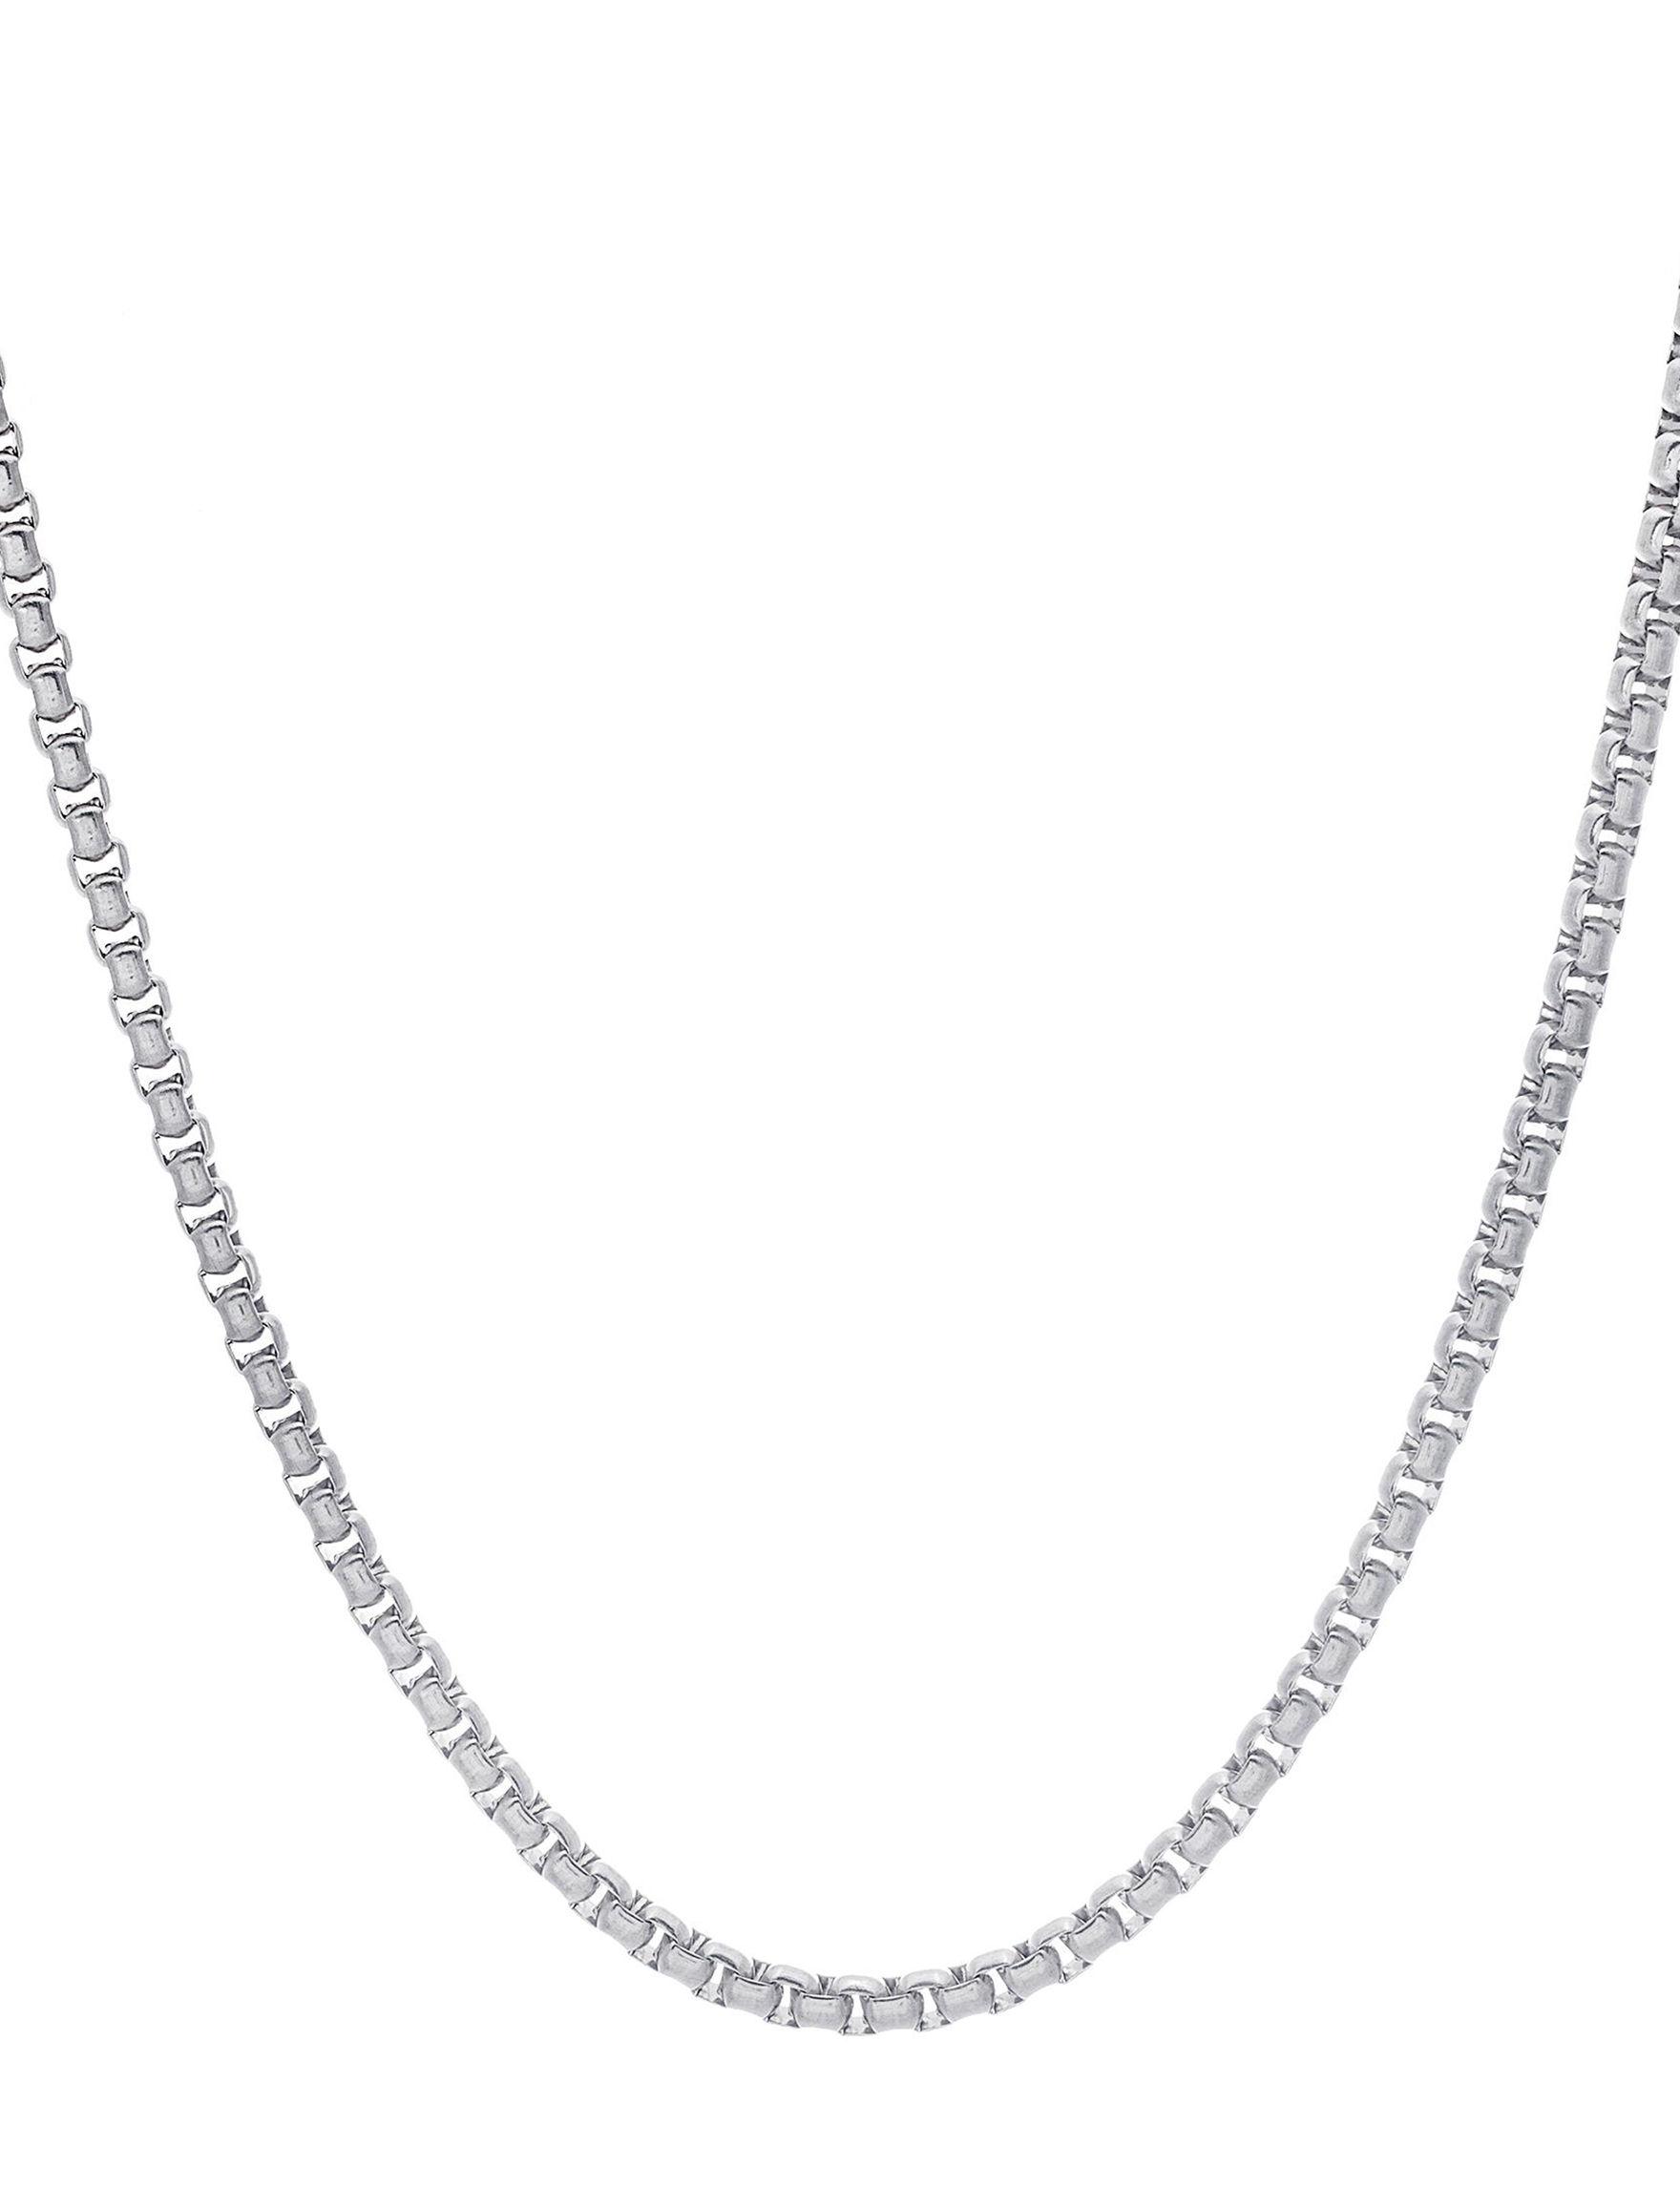 NES Stainless Steel Necklaces & Pendants Fine Jewelry